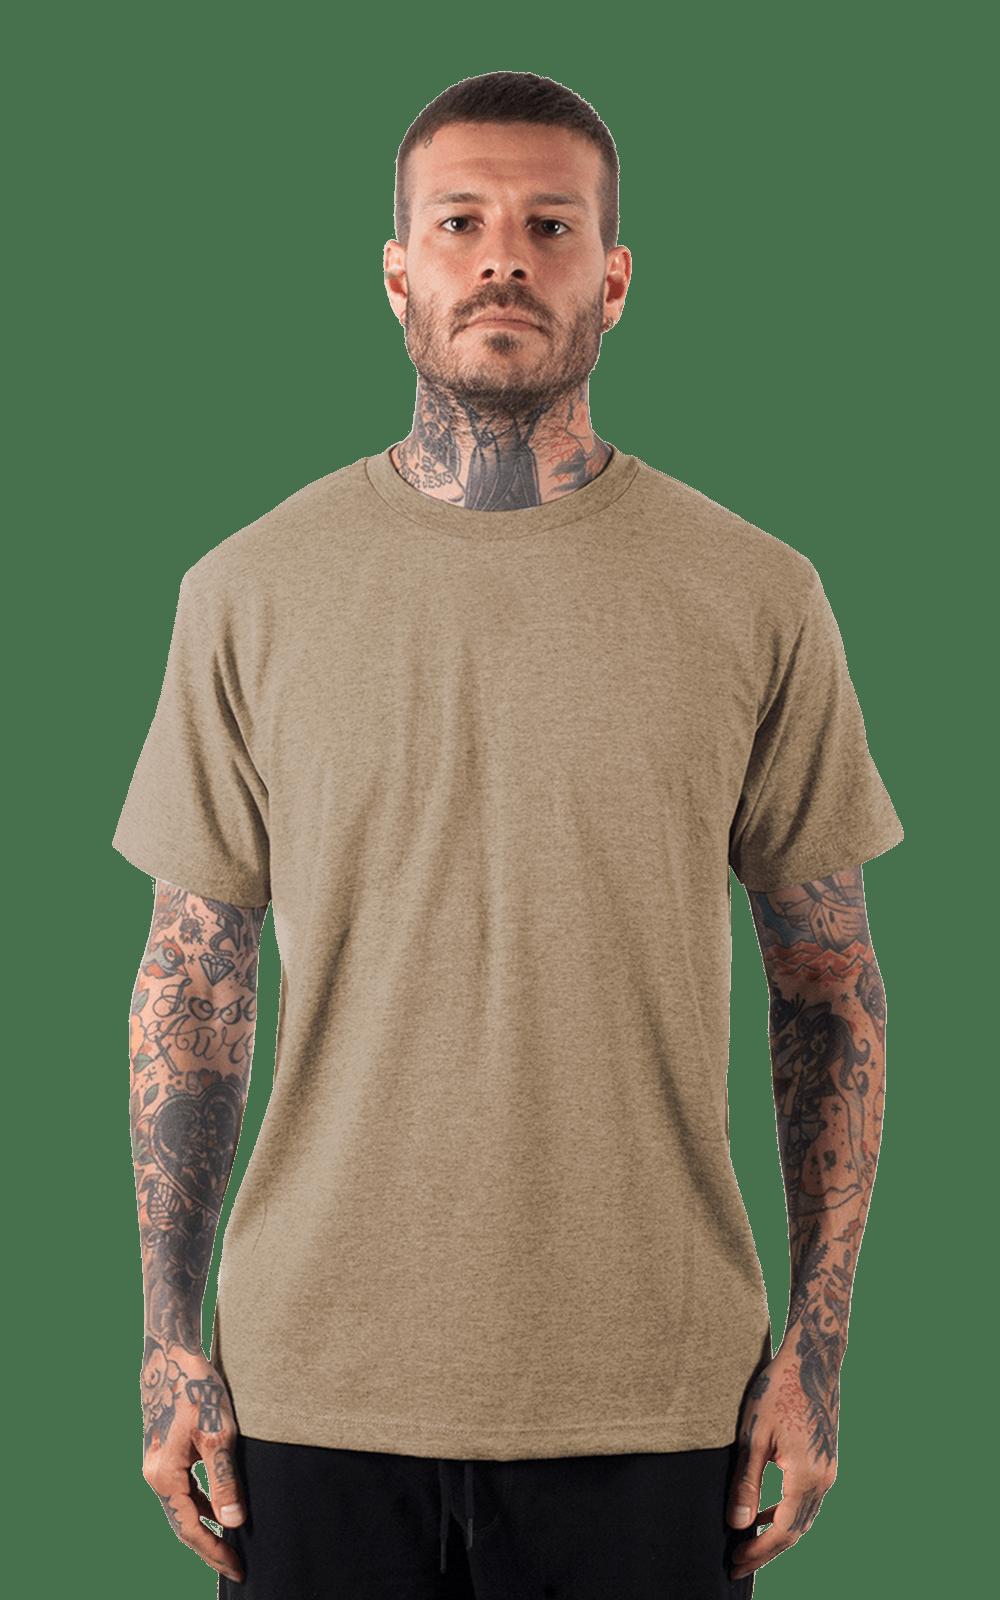 Camiseta_Tubo_KhakiHTR_Frente